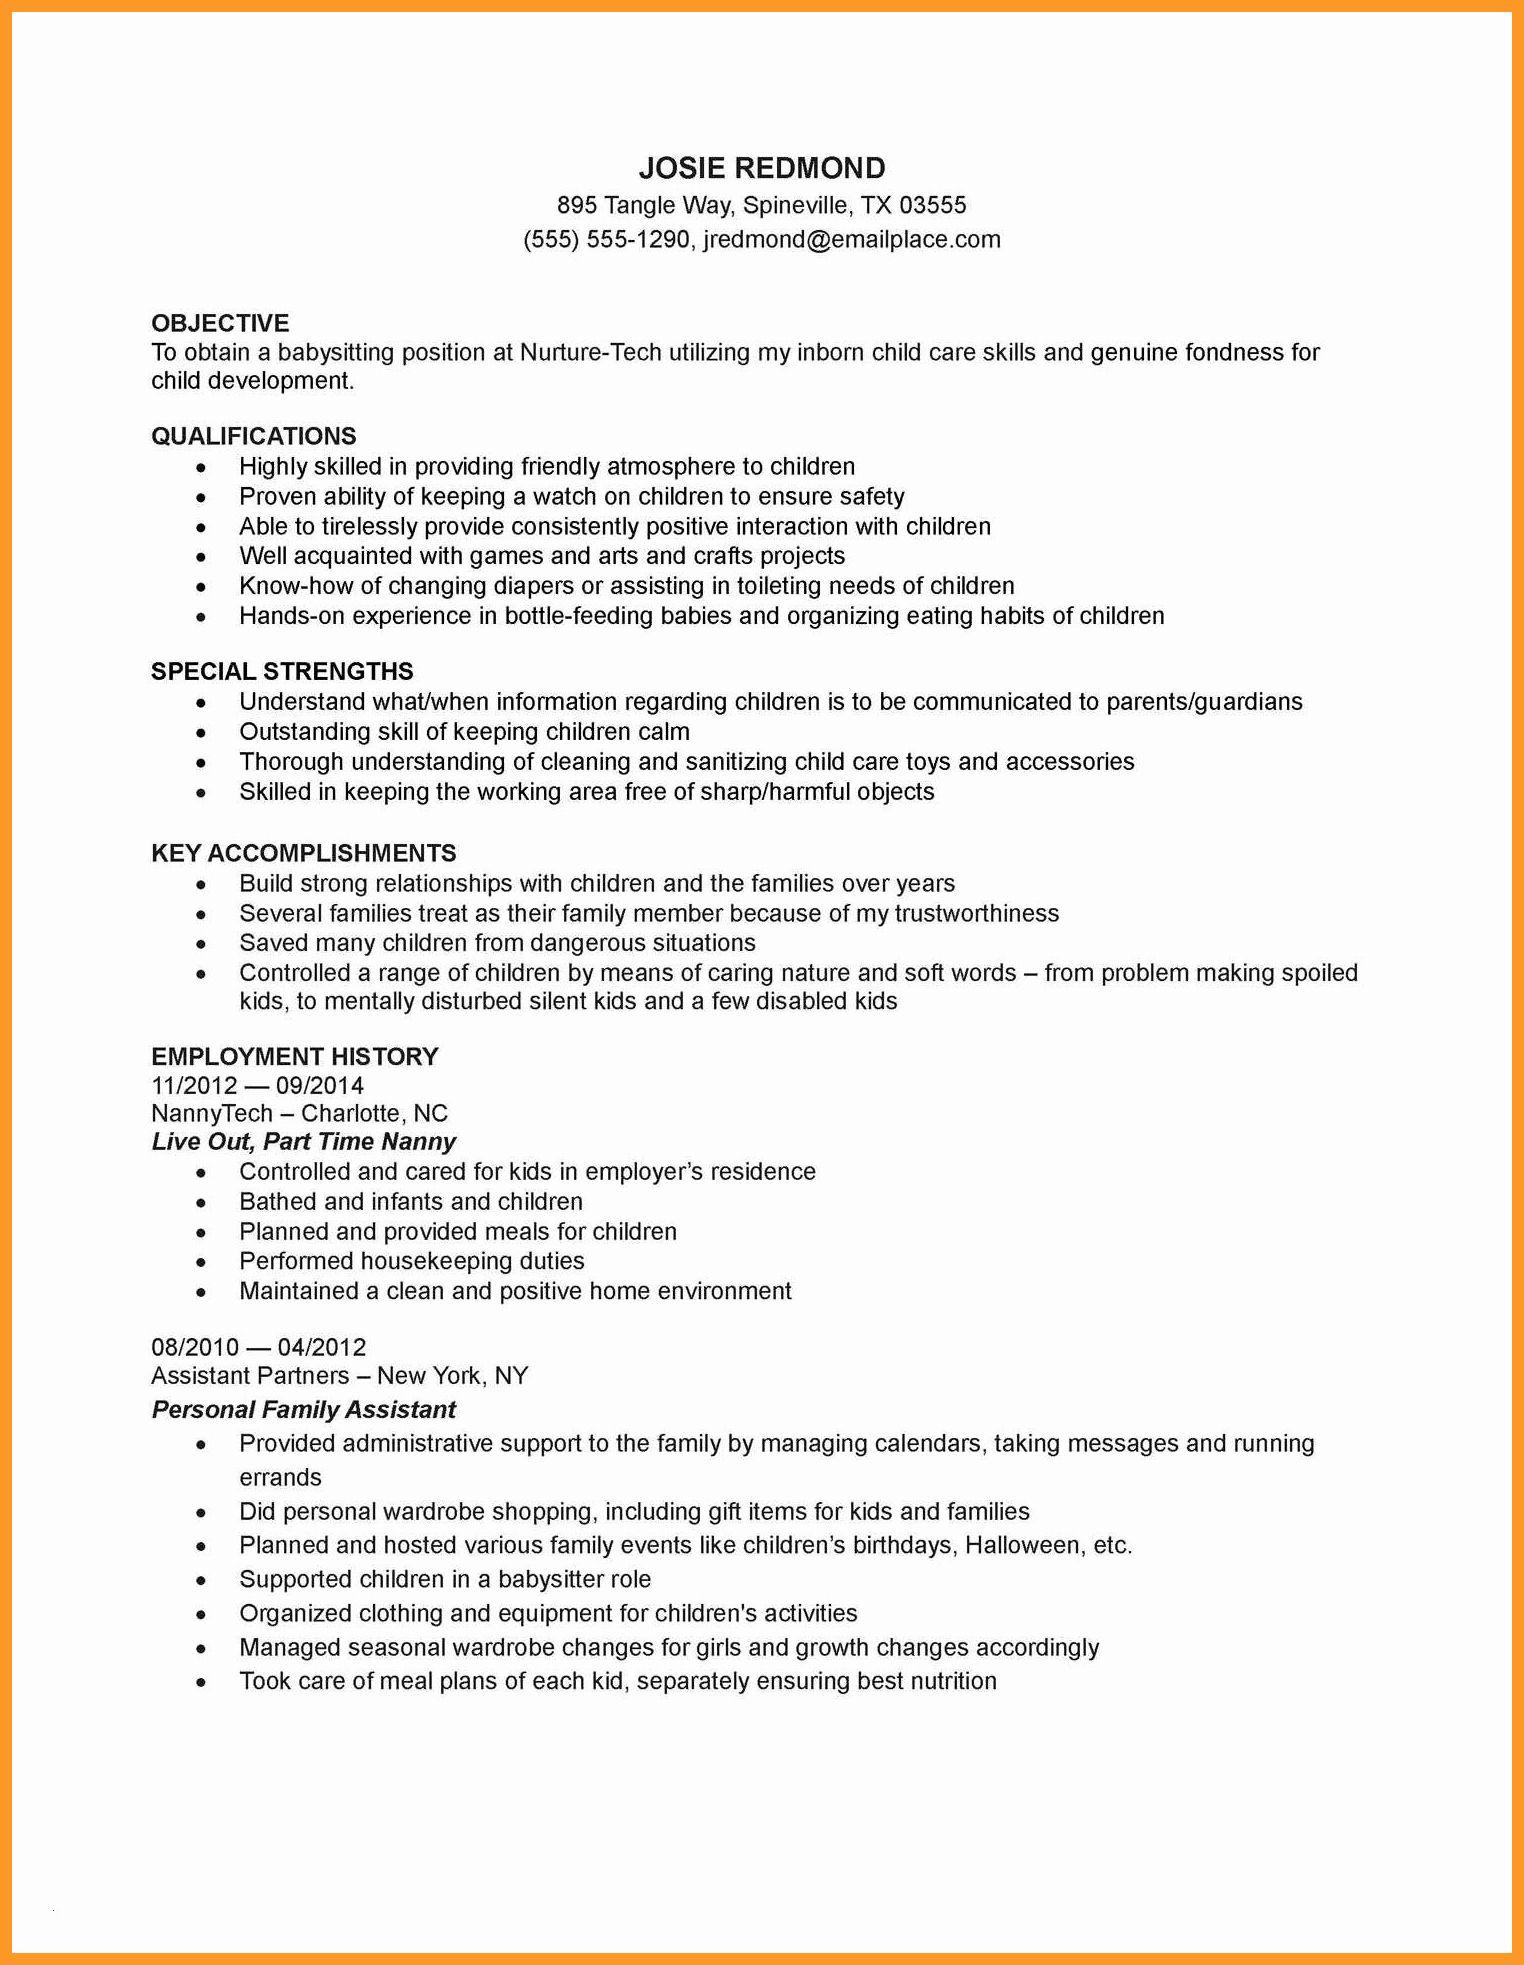 Child care job description resume awesome 9 10 child care